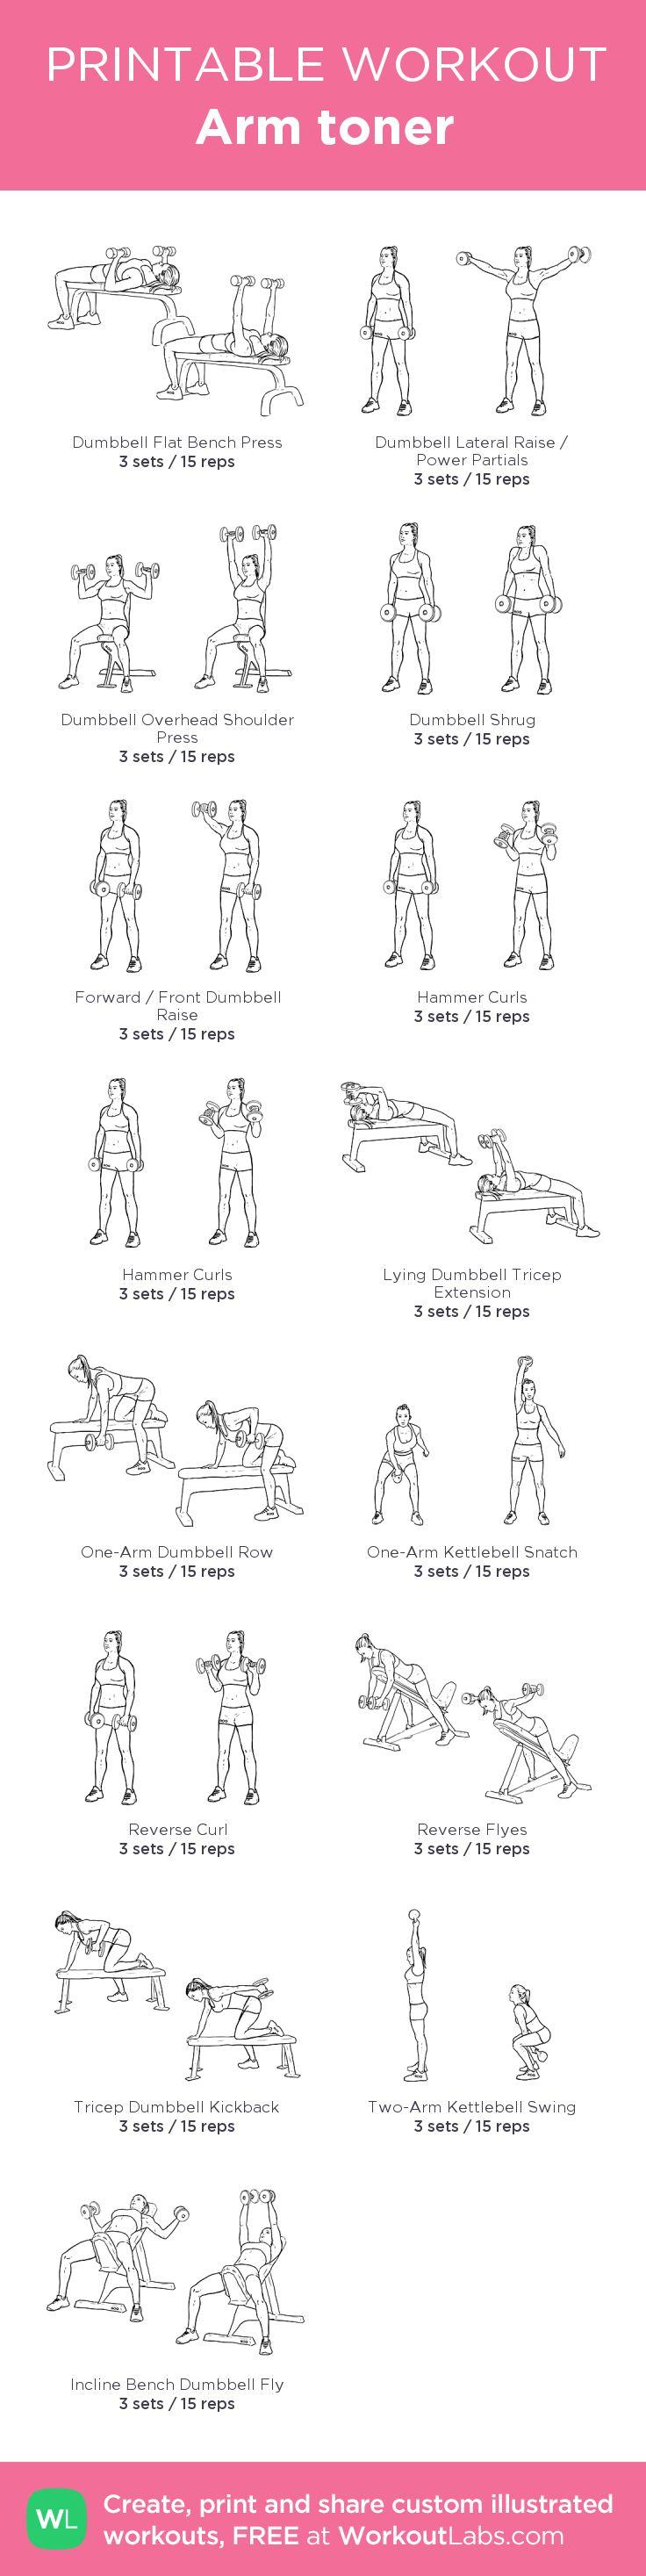 Arm toner –my custom workout created at WorkoutLabs.com